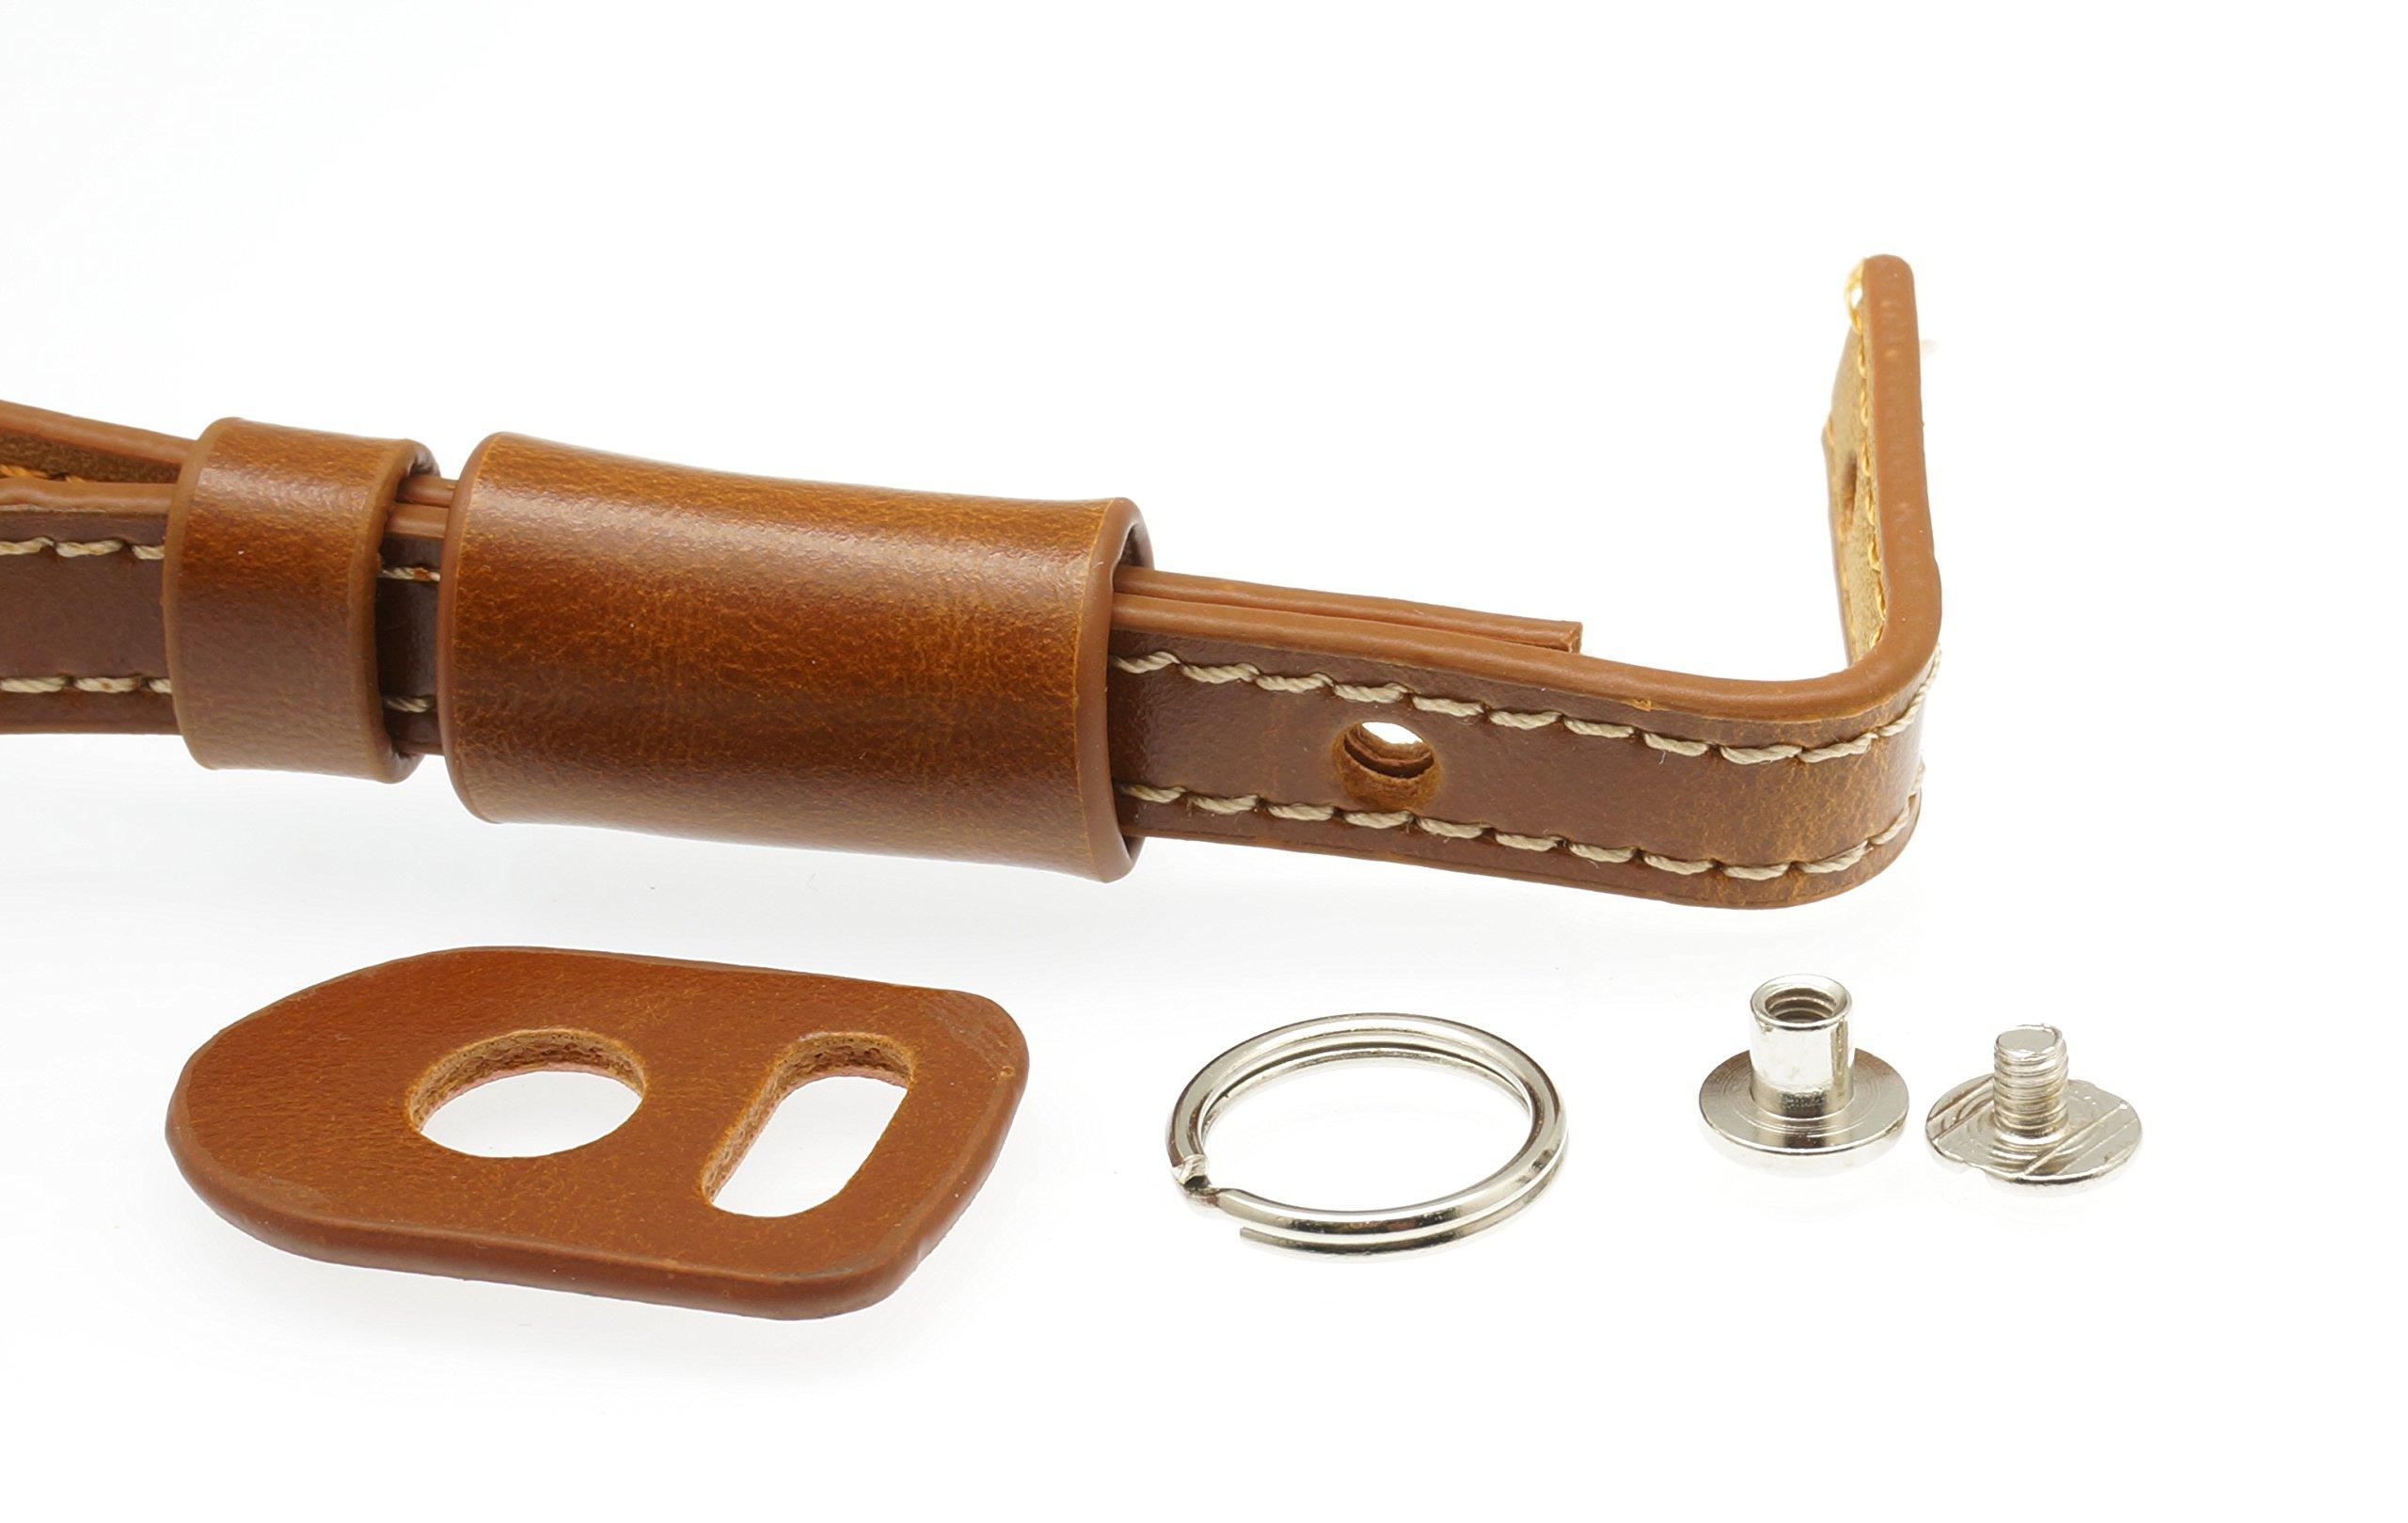 Gadget Place Light Brown Classy Leather Wrist Strap for Panasonic Lumix DMC-LX10 LX15 LX100 LX7 LX5 TS6 FT6 TS30 FT30 SZ10 ZS45 TZ57 ZS50 TZ70